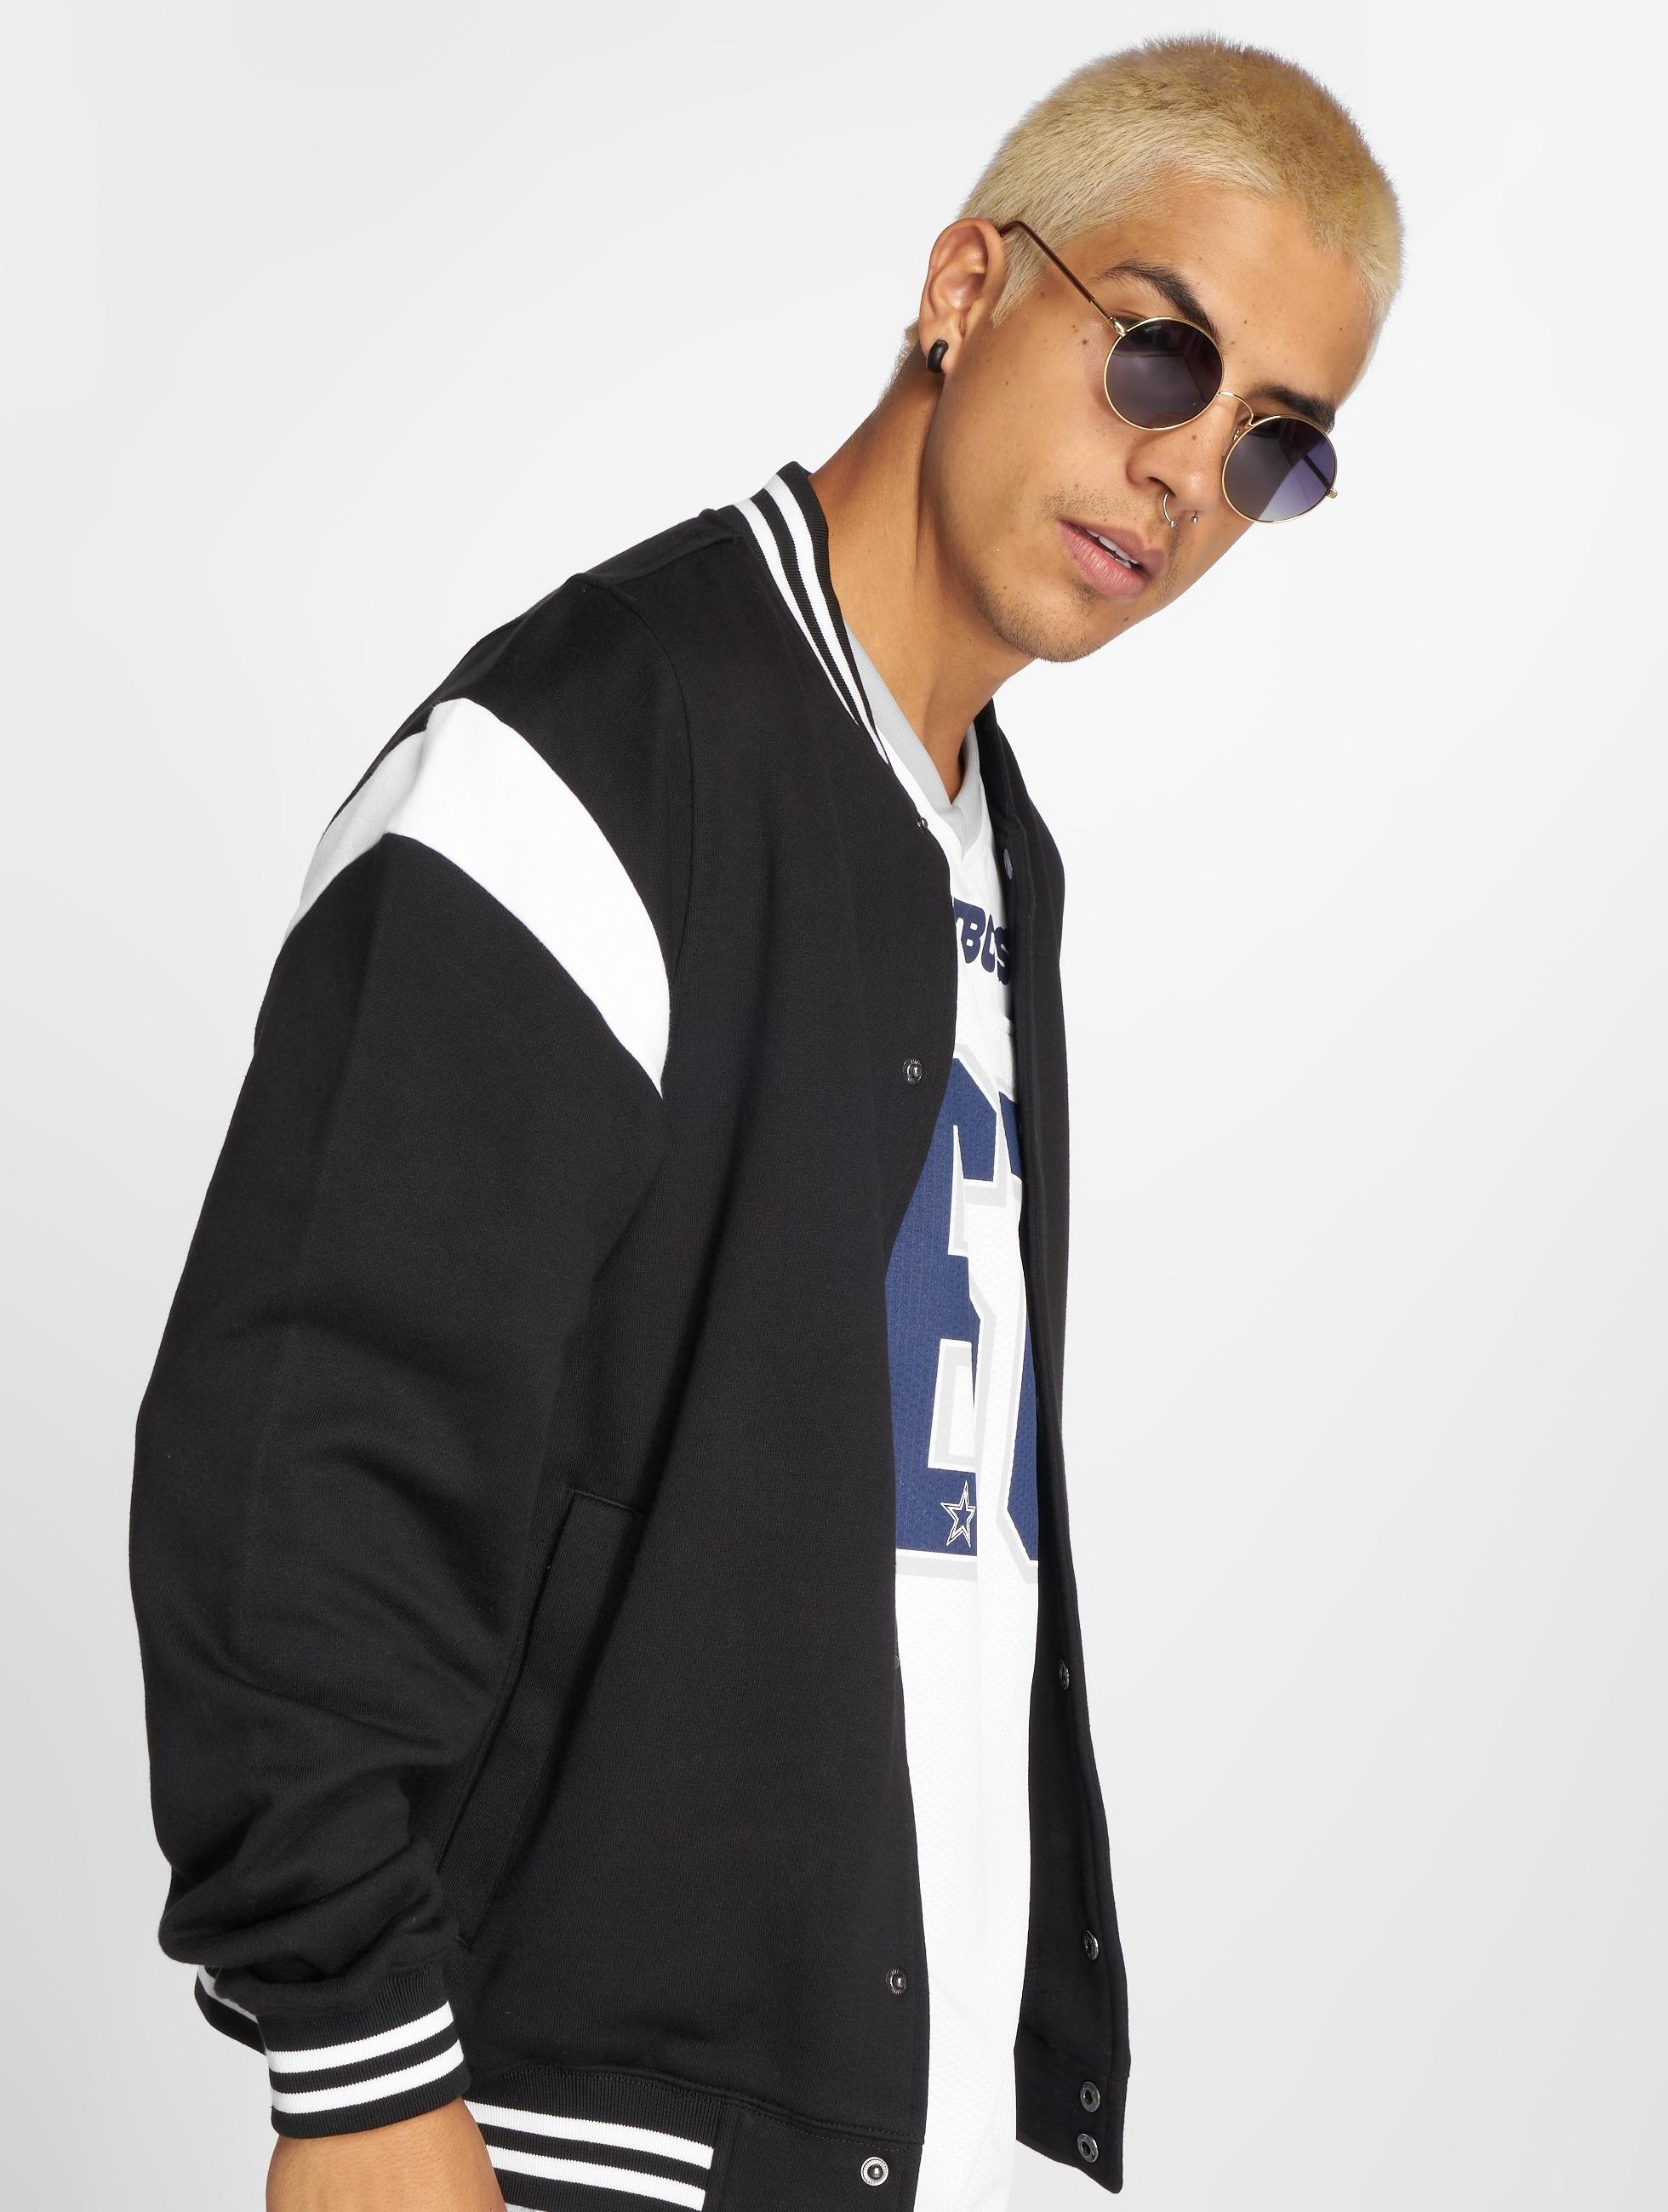 Urban Classics Inset College Jacket BlackWhite